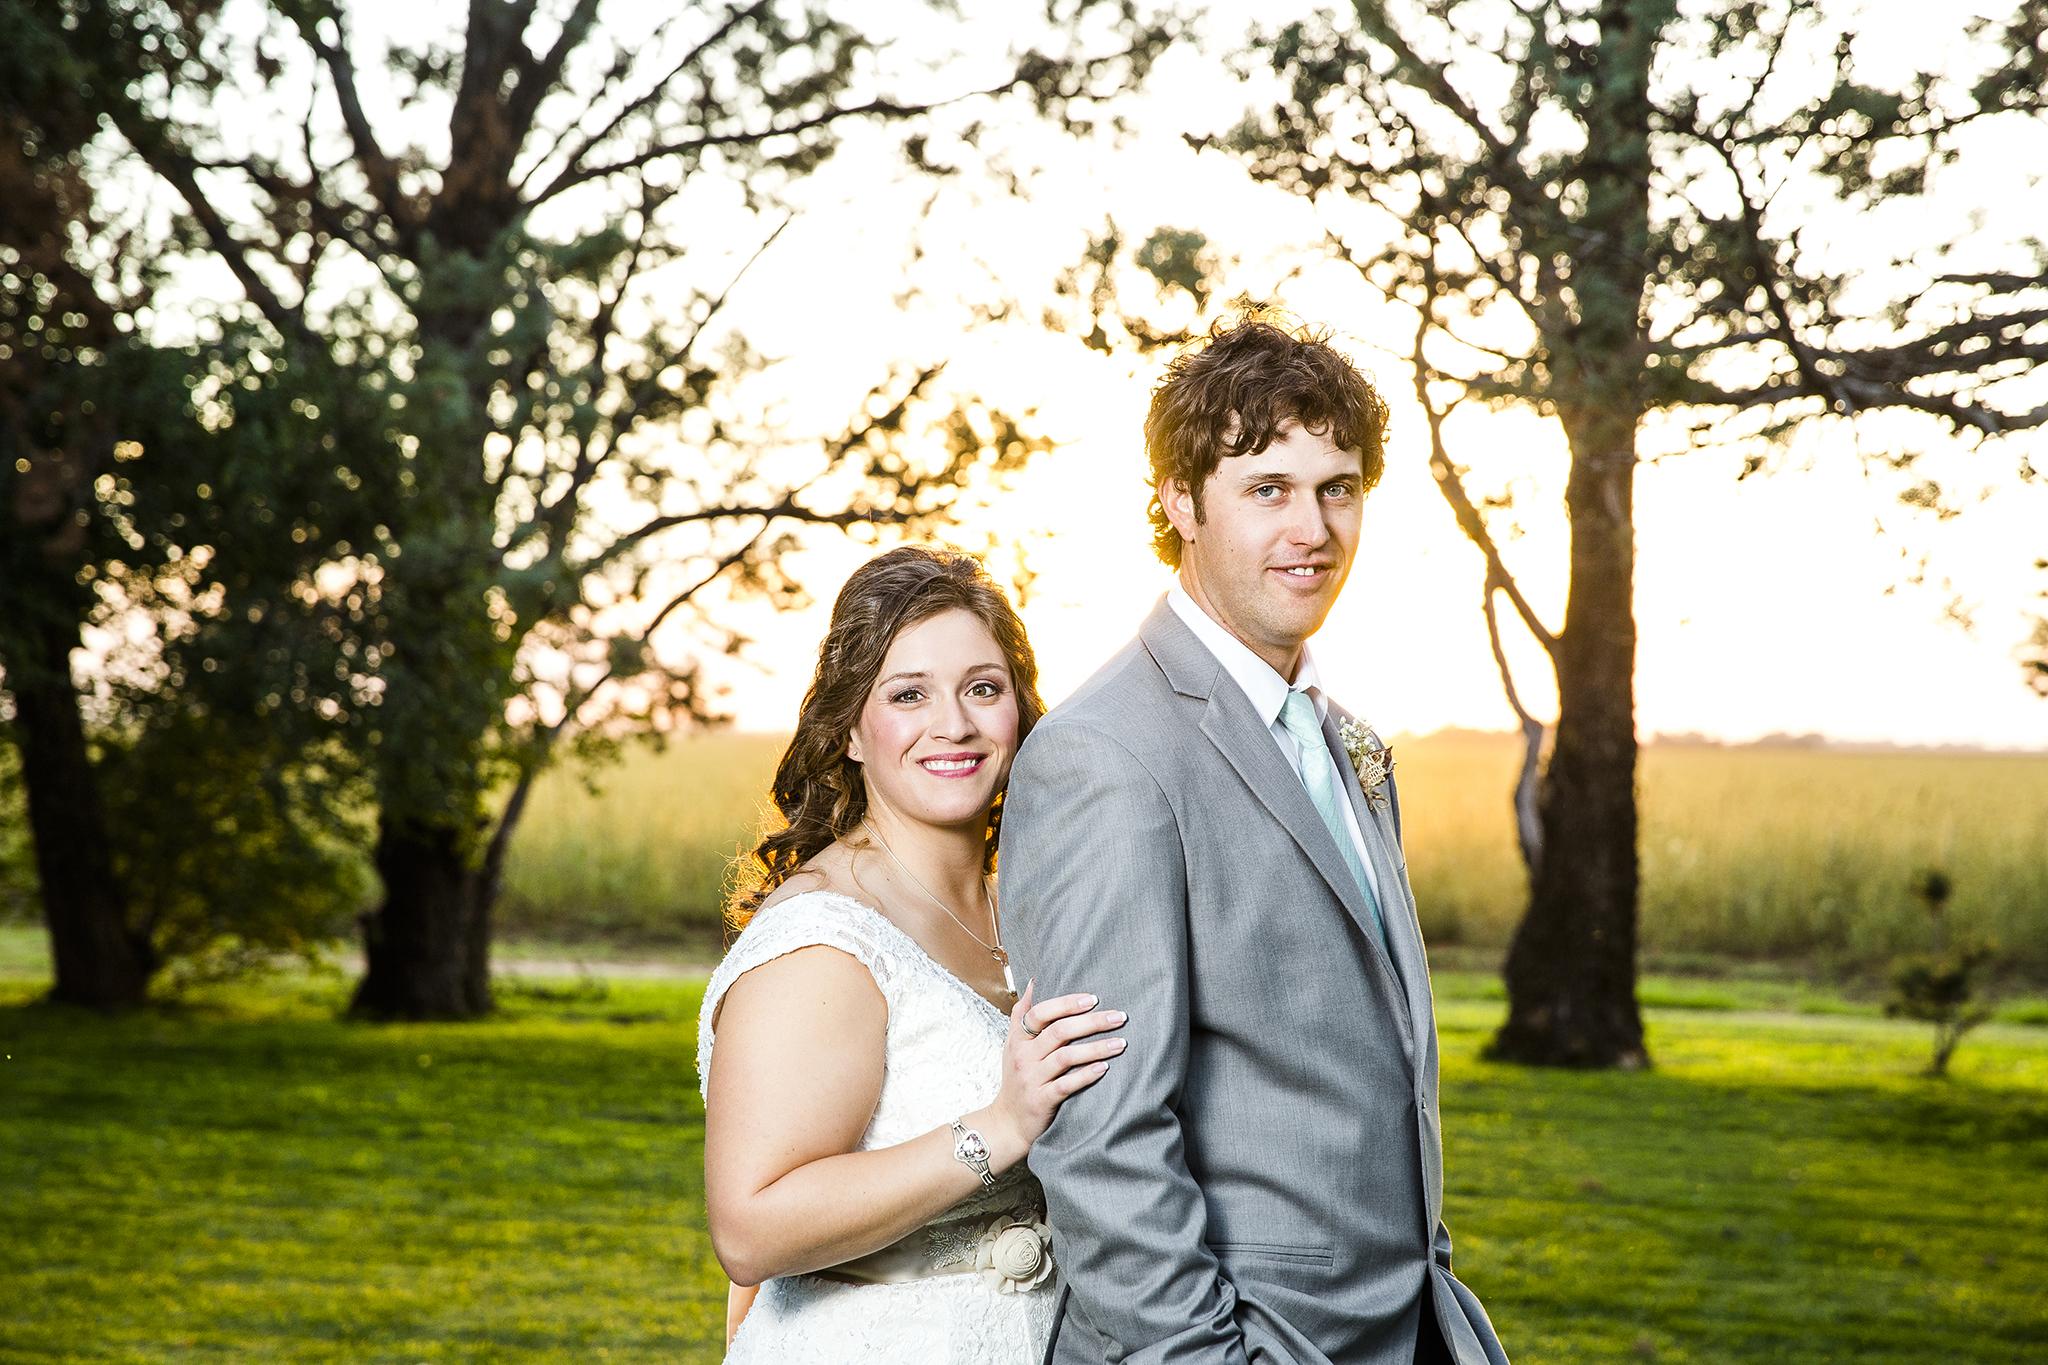 Lubbock Wedding Photography Wedding Photographer Walnut Tree Bride and Groom Portrait